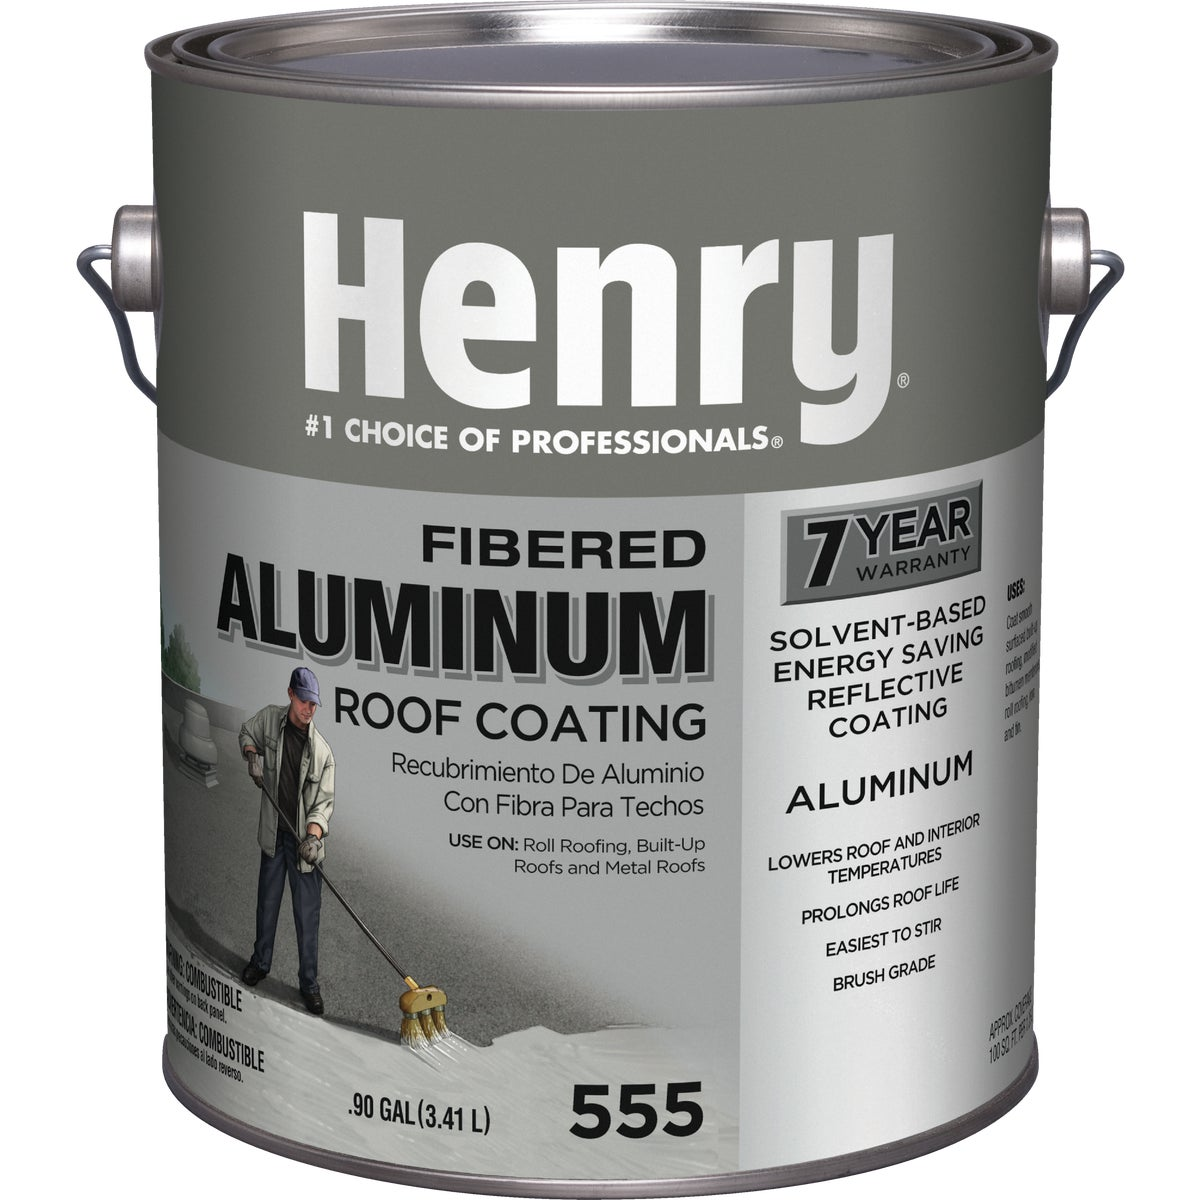 GAL ALUMINUM RF COATING - HE555042 by Henry Company